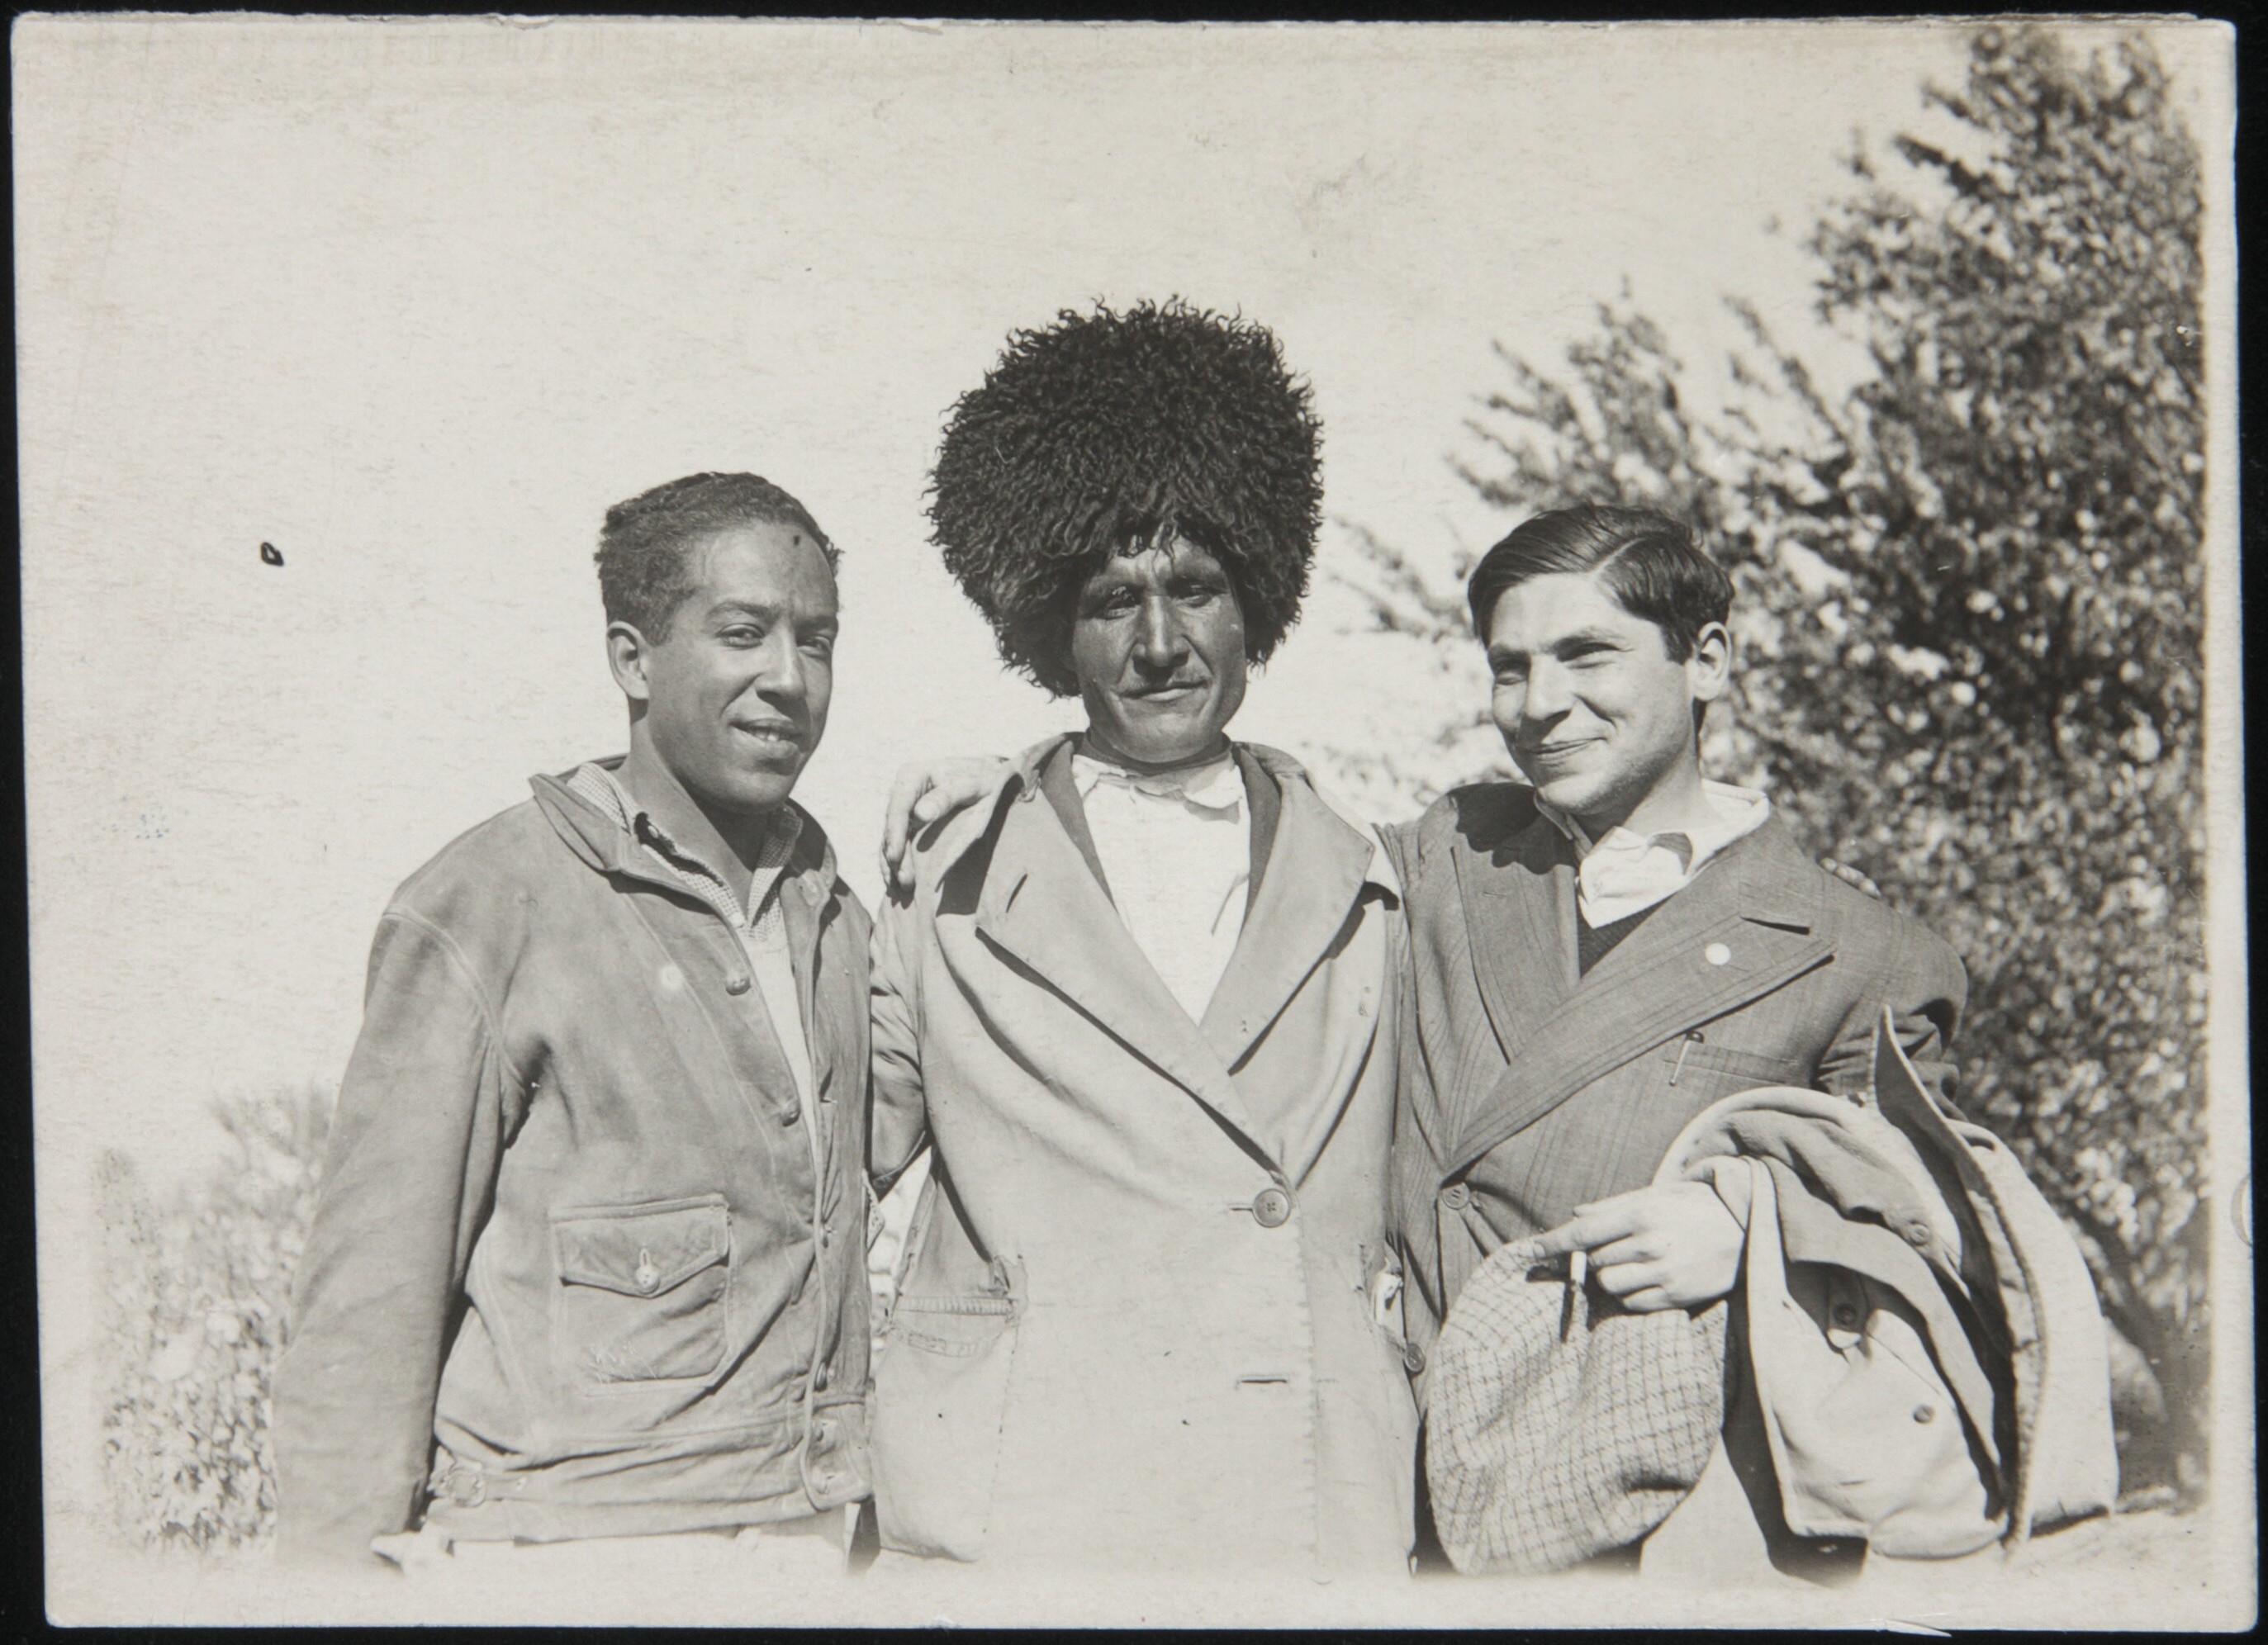 Langston Hughes and German journalist Arthur Koestler on a cotton kolhoy in Soviet Central Asia, 1932